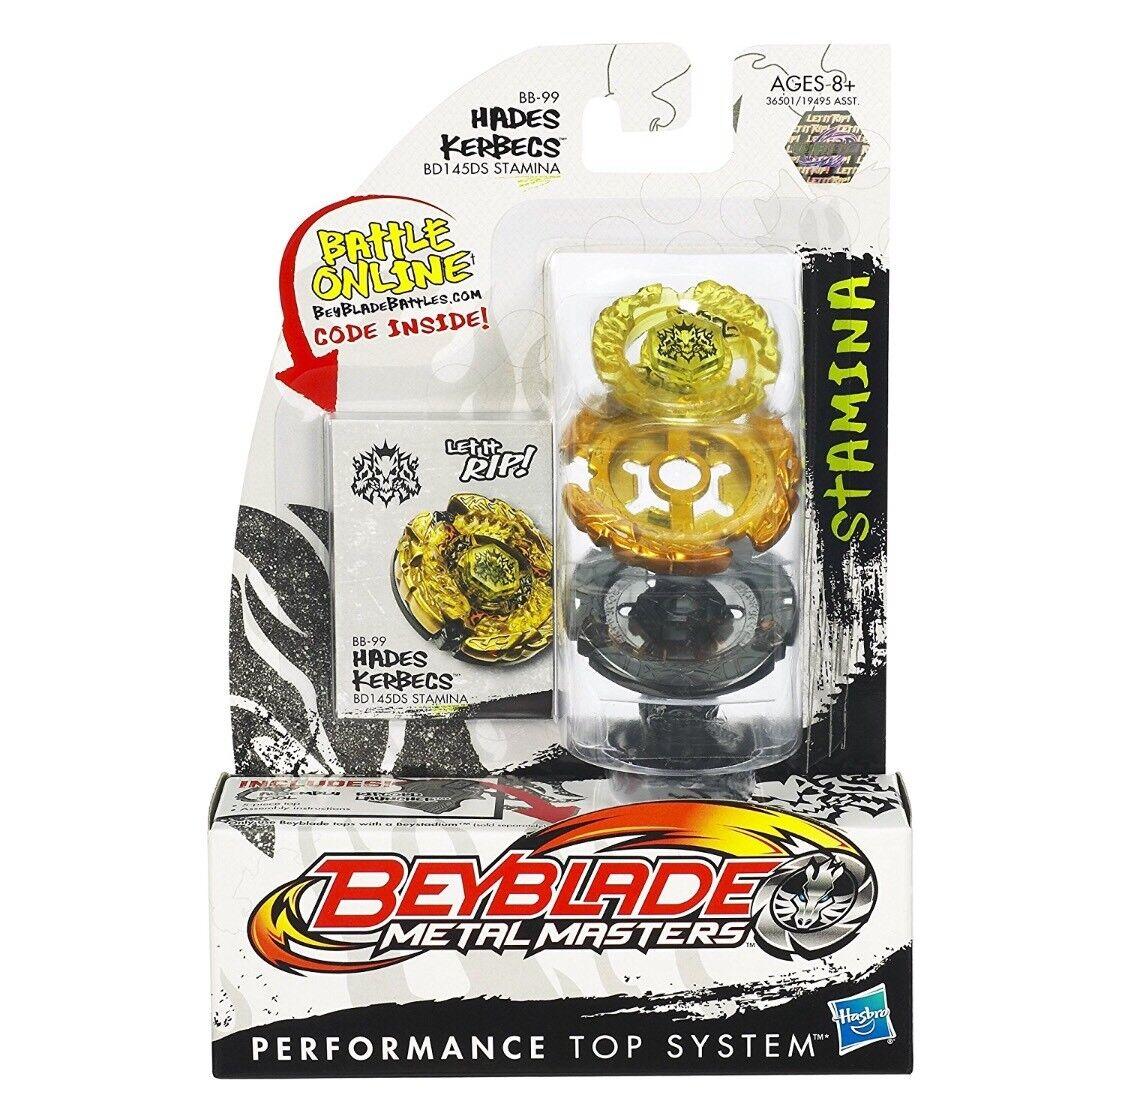 Hasbro Beyblade Hades Kerbecs BD145DS BD145DS BD145DS BB99 USA SELLER Metal Masters a67dba